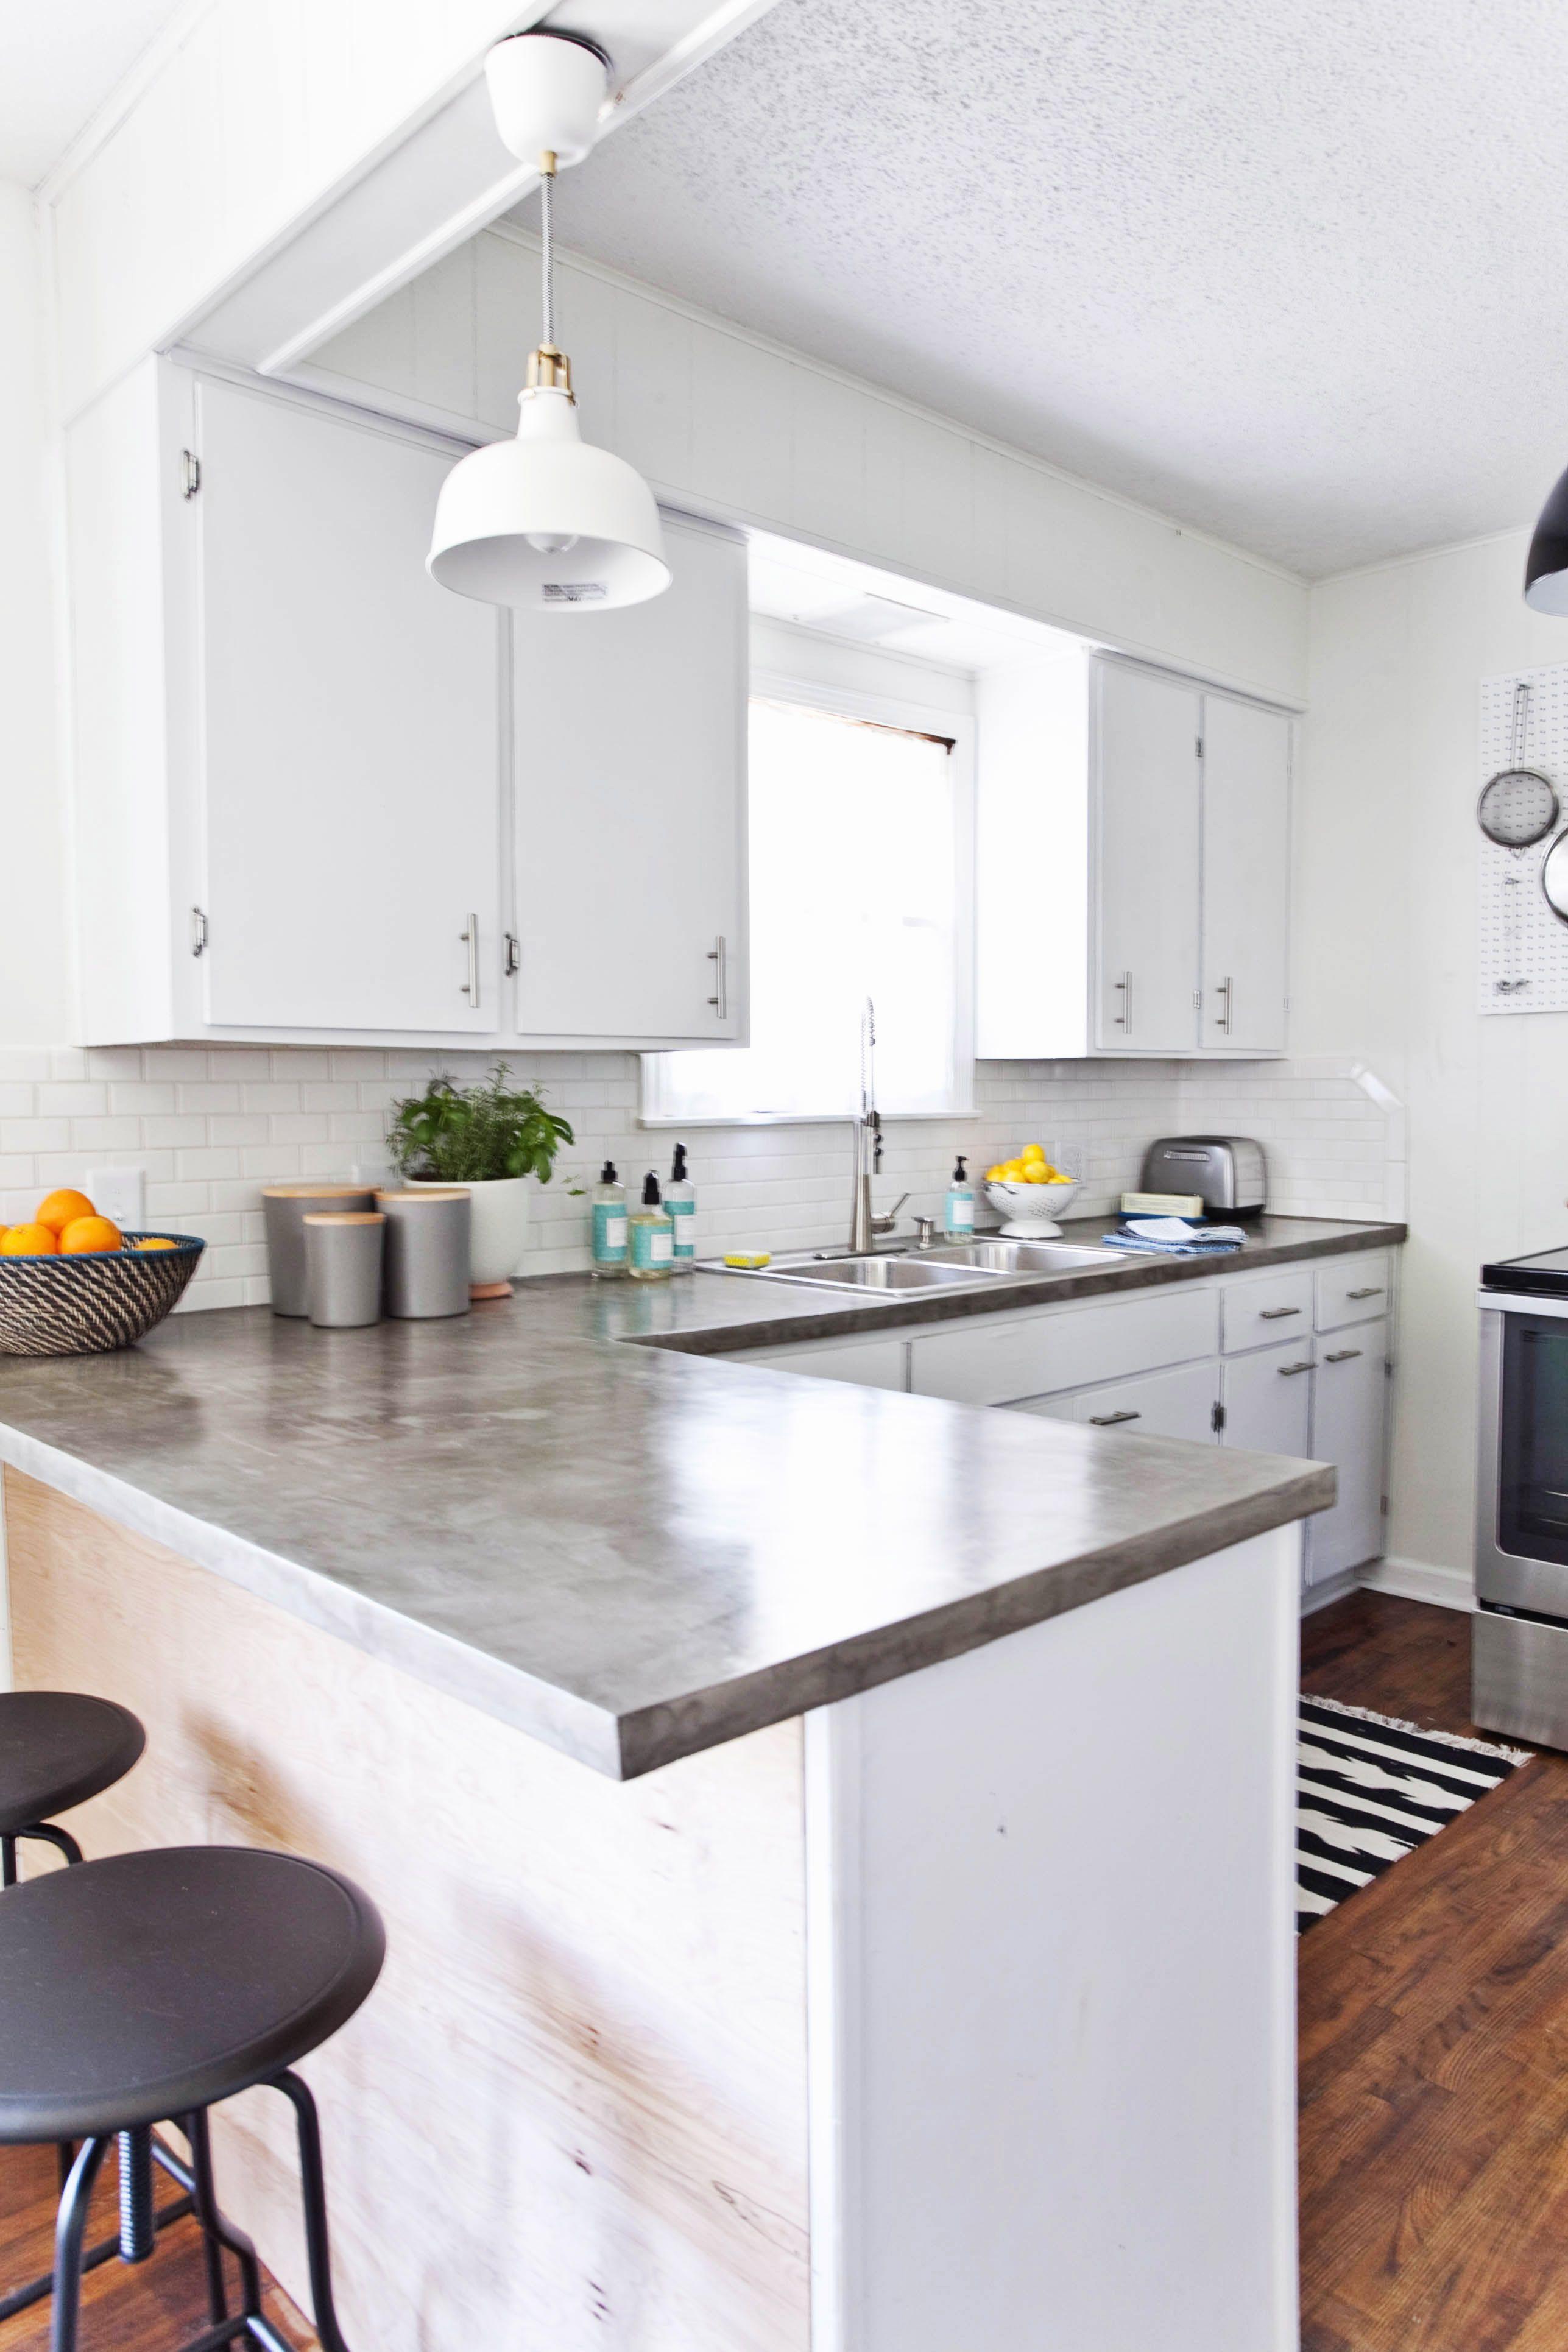 Elle Decor & 14 Best White Kitchen Cabinets - Design Ideas for White Cabinets